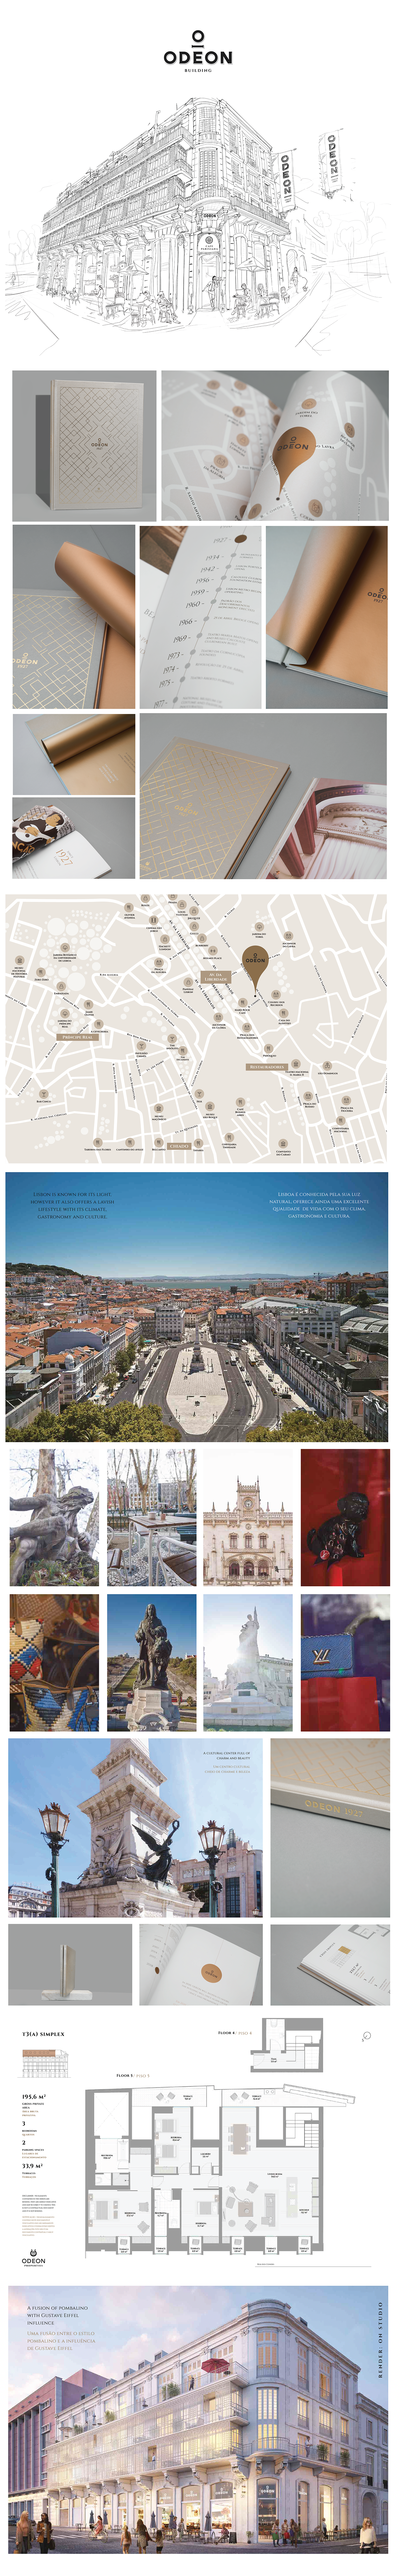 apartments luxury apartments architecture 3D renders branding  Lisbon Portugal real estate